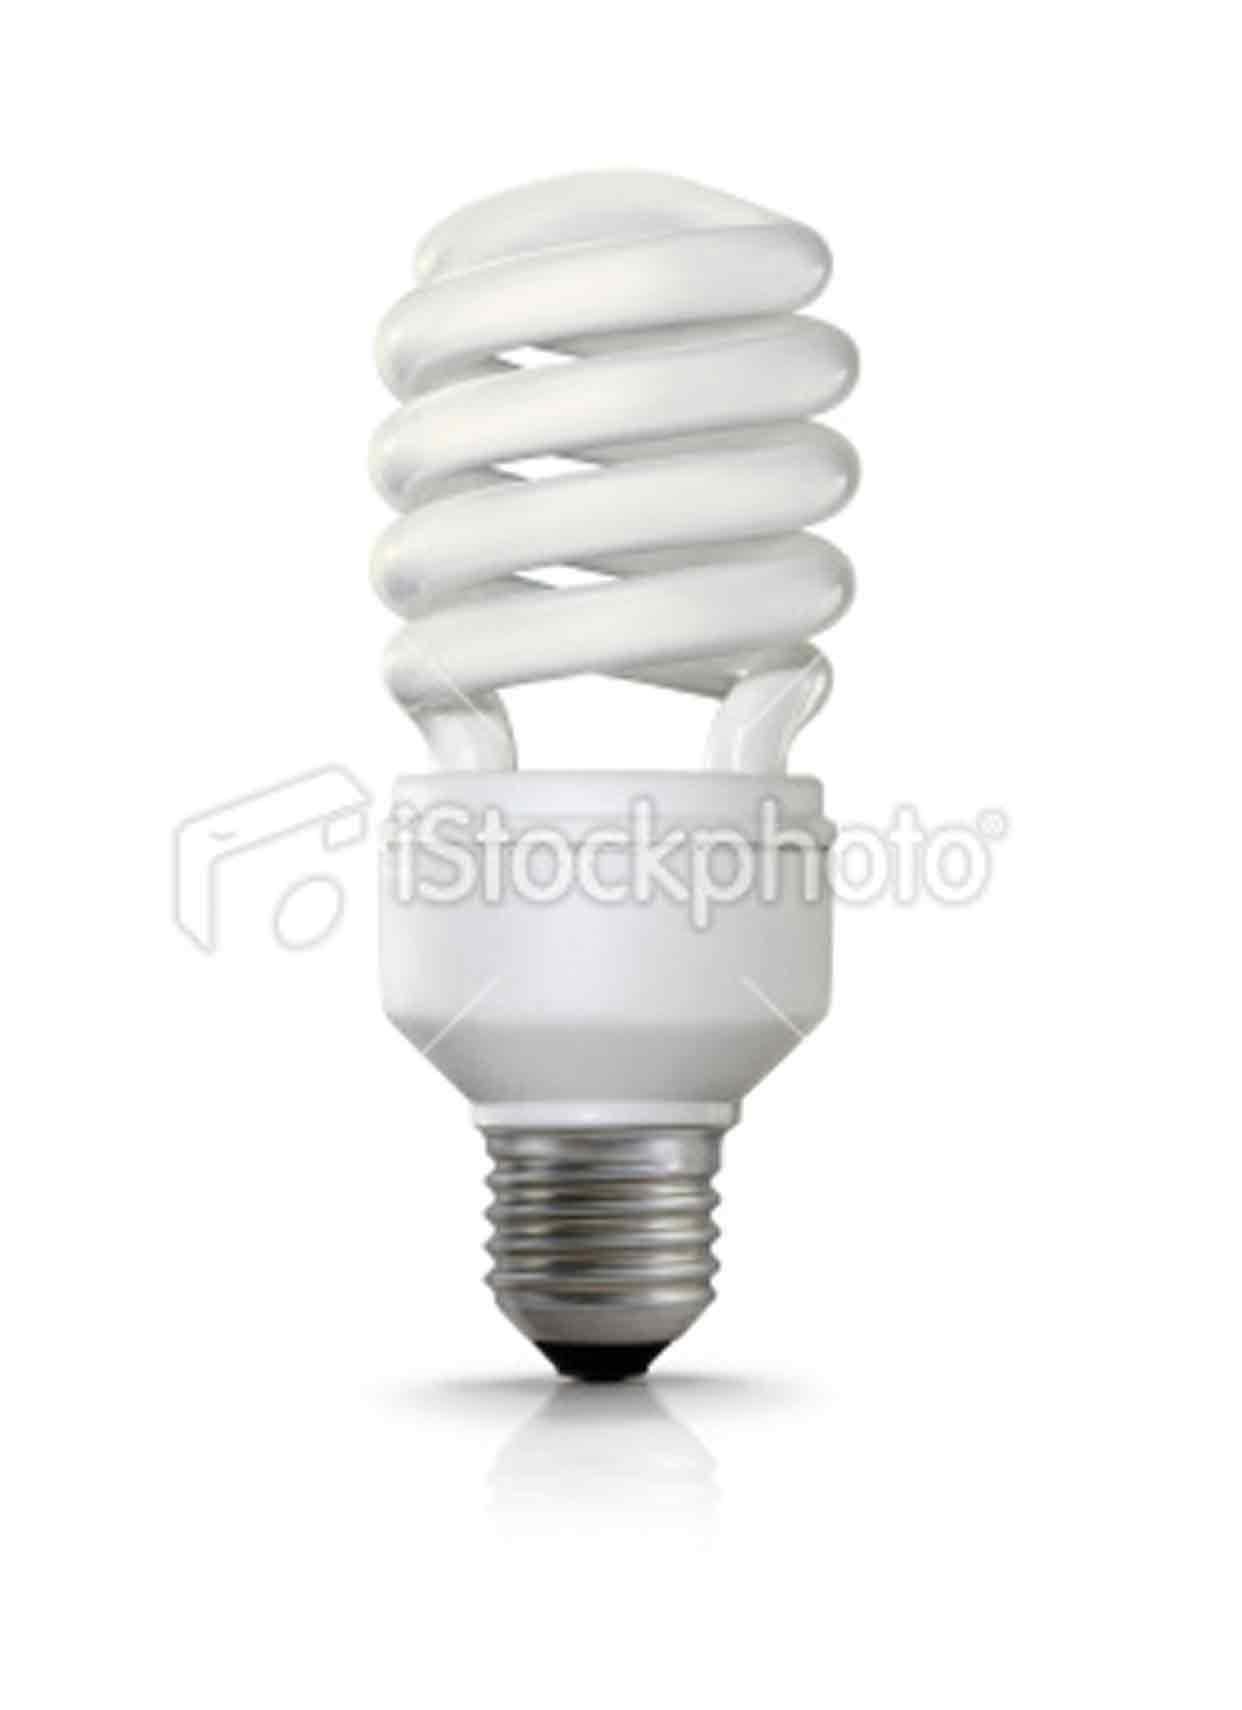 Ist2 6694161 Compact Fluorescent Lightbulb